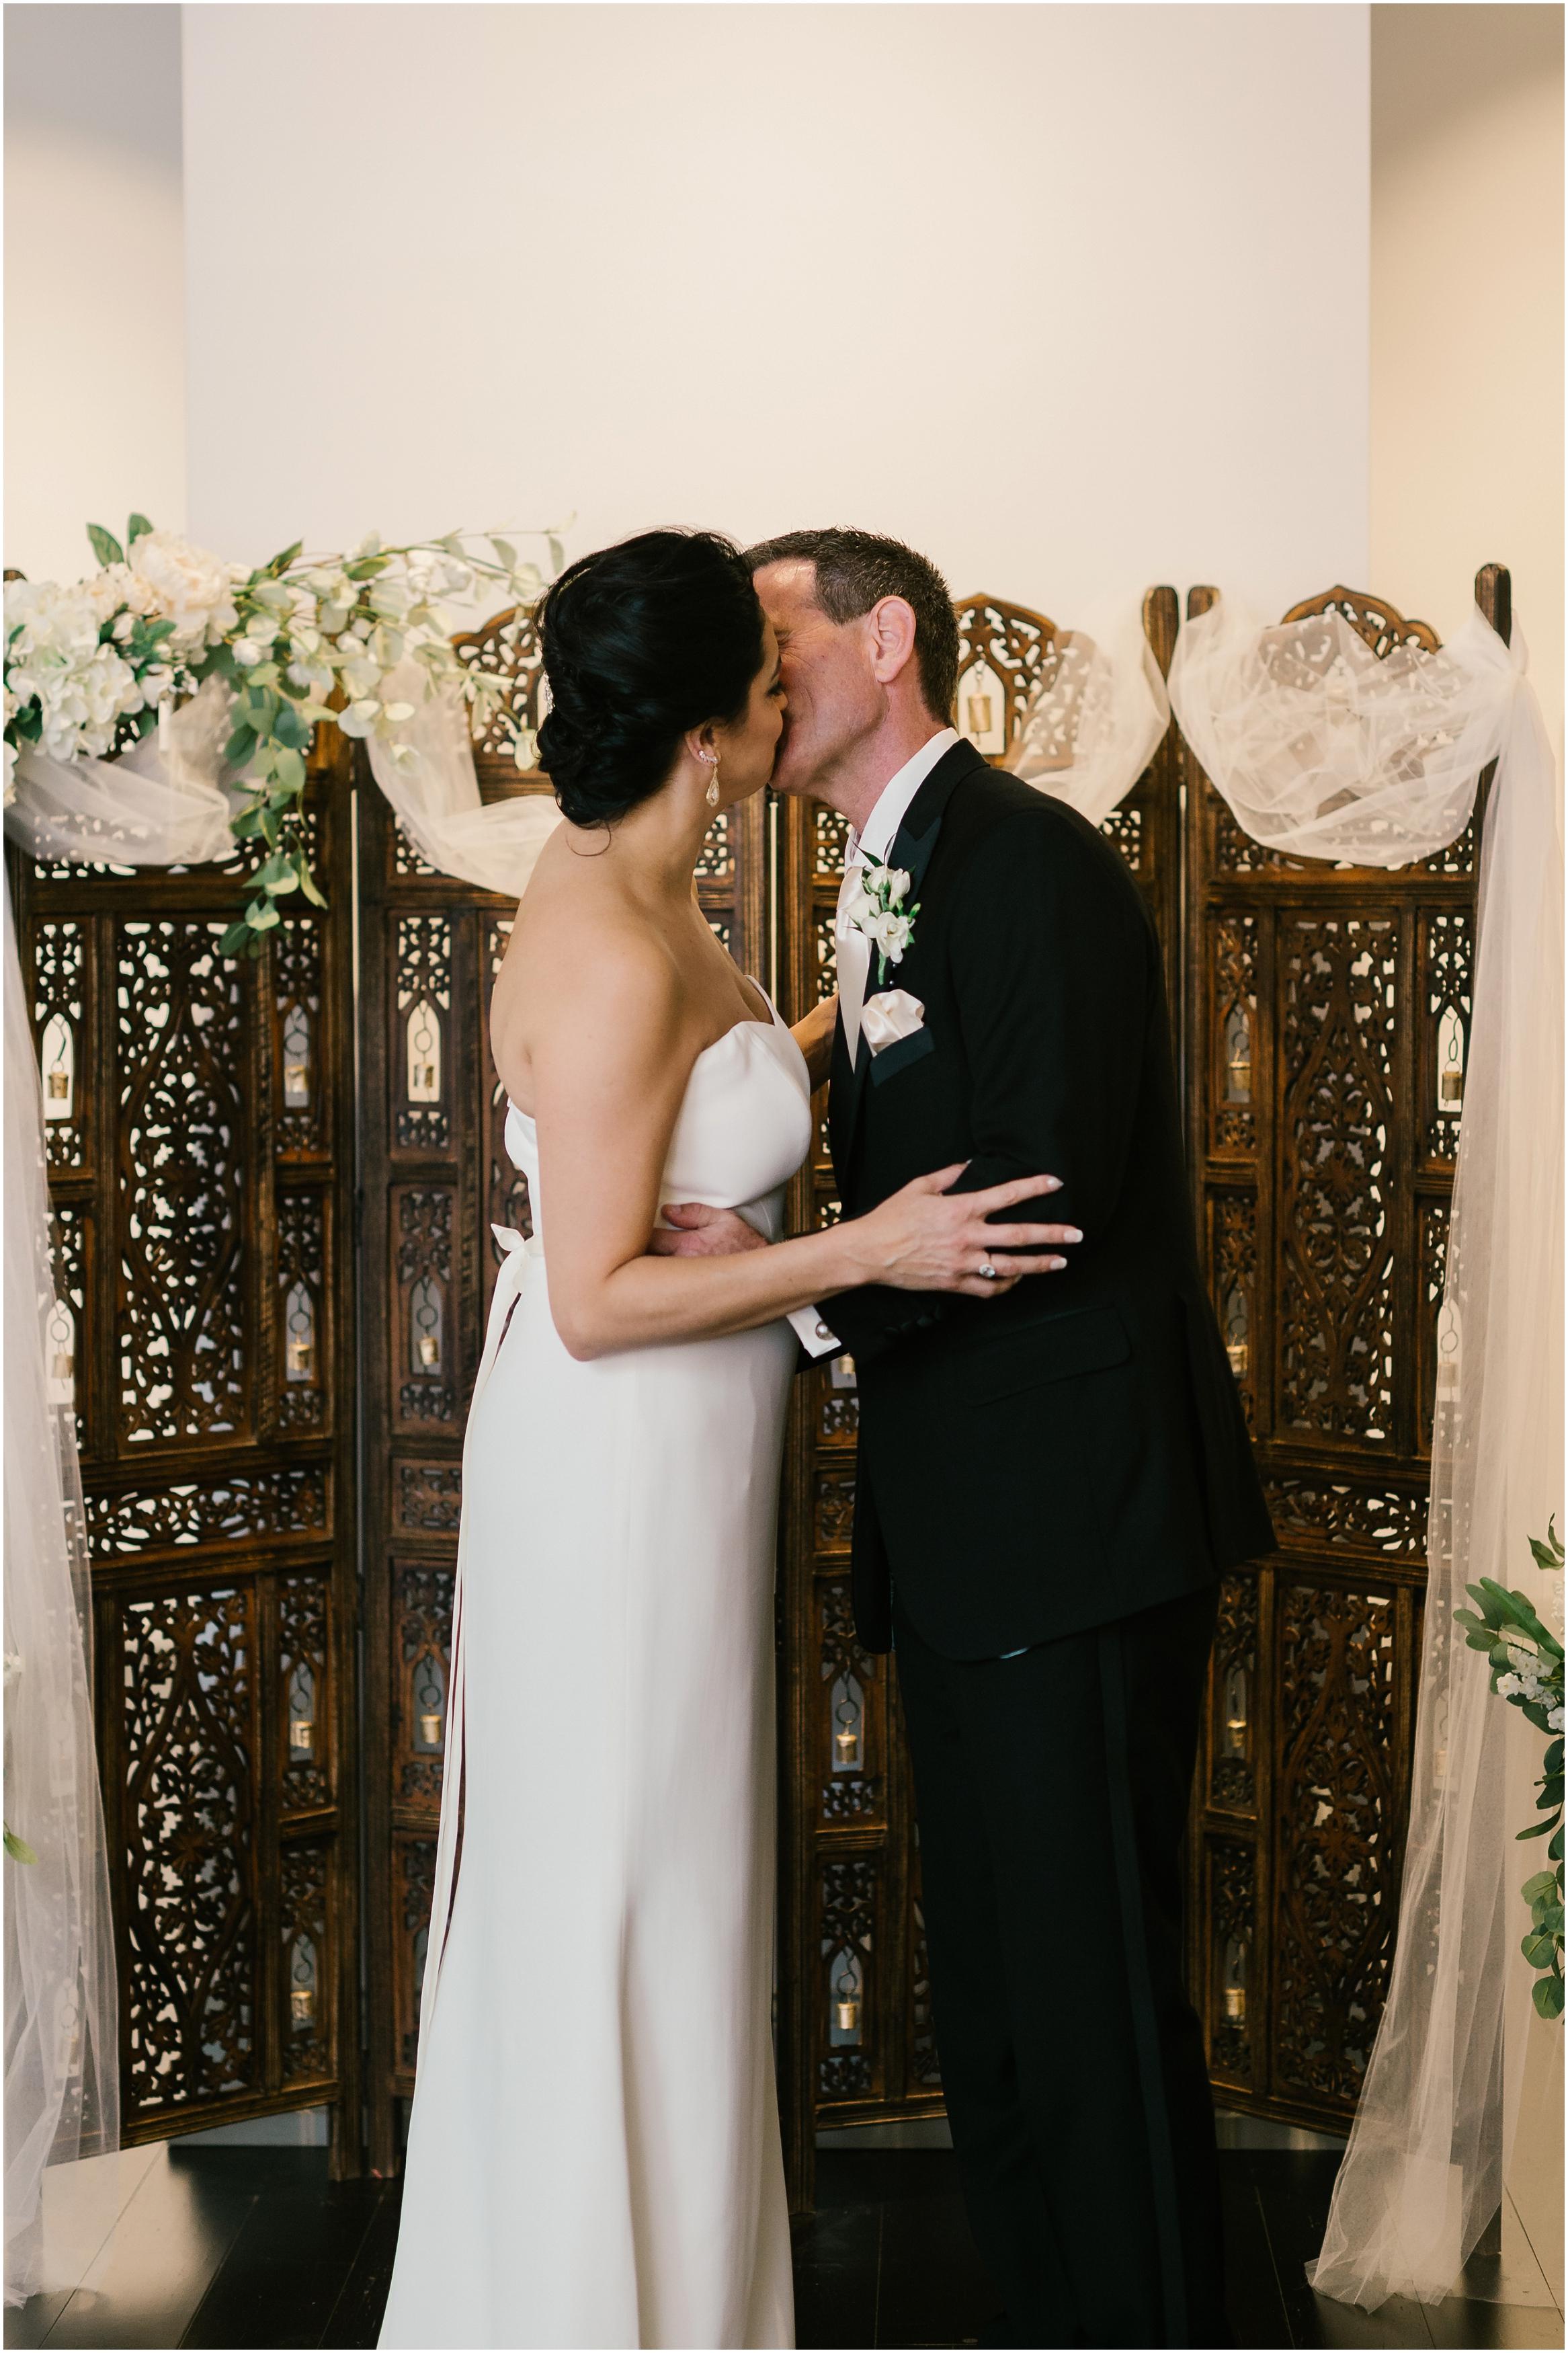 Rebecca_Shehorn_Photography_Indianapolis_Wedding_Photographer_8559.jpg